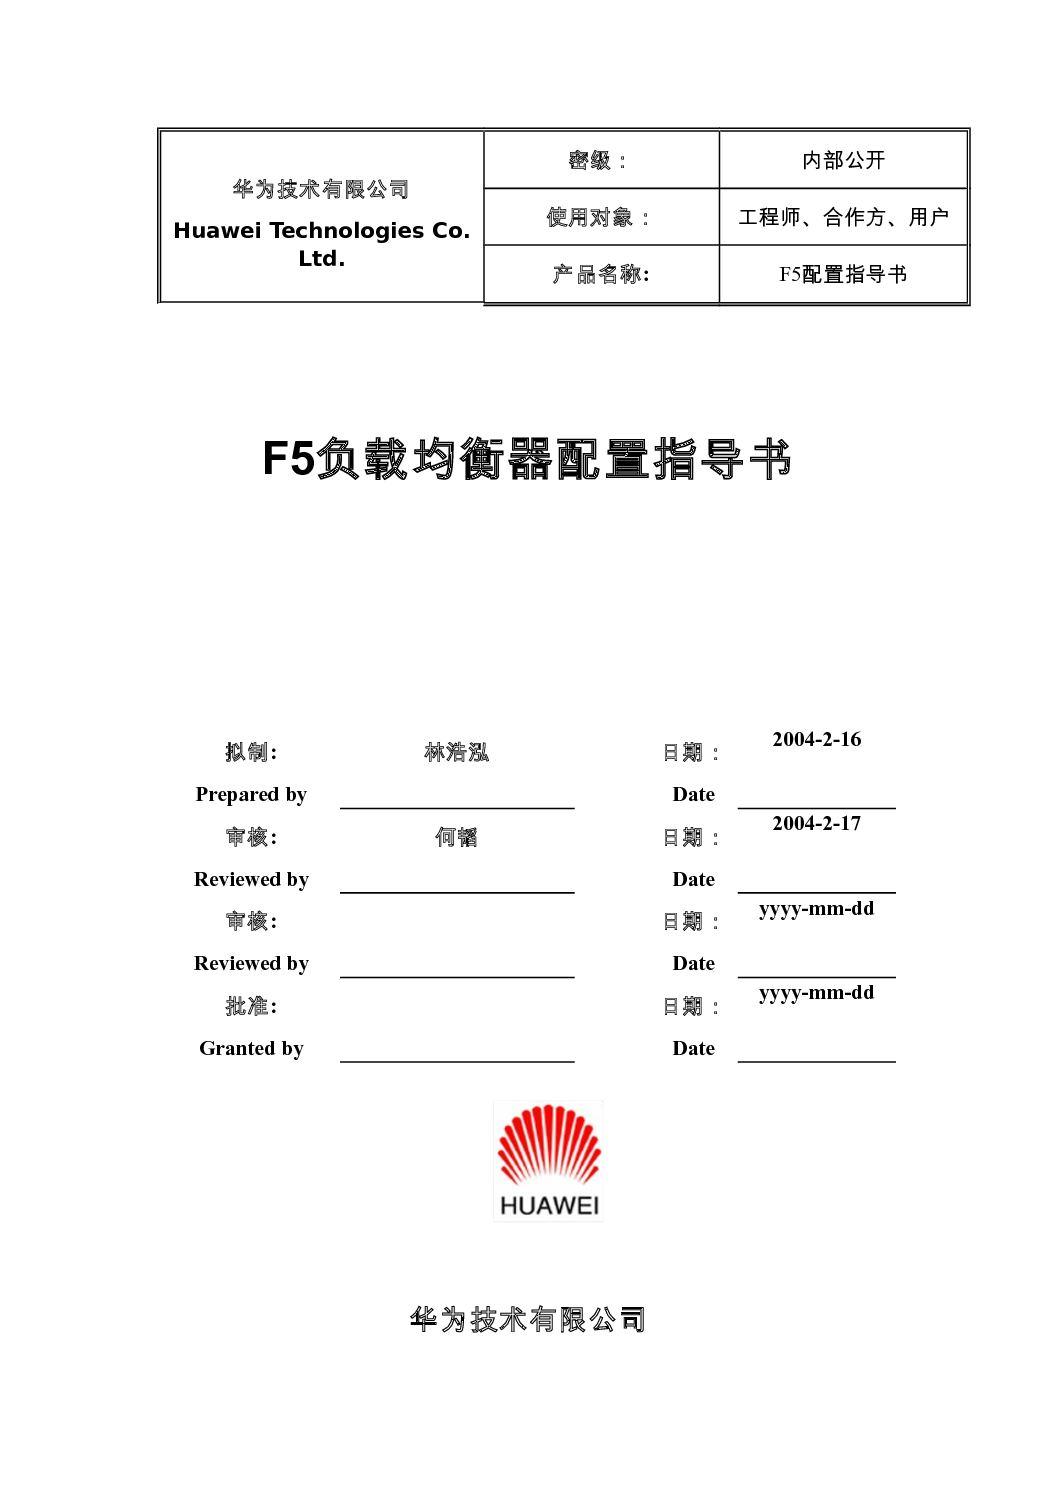 Calaméo - F5负载均衡器配置指导书